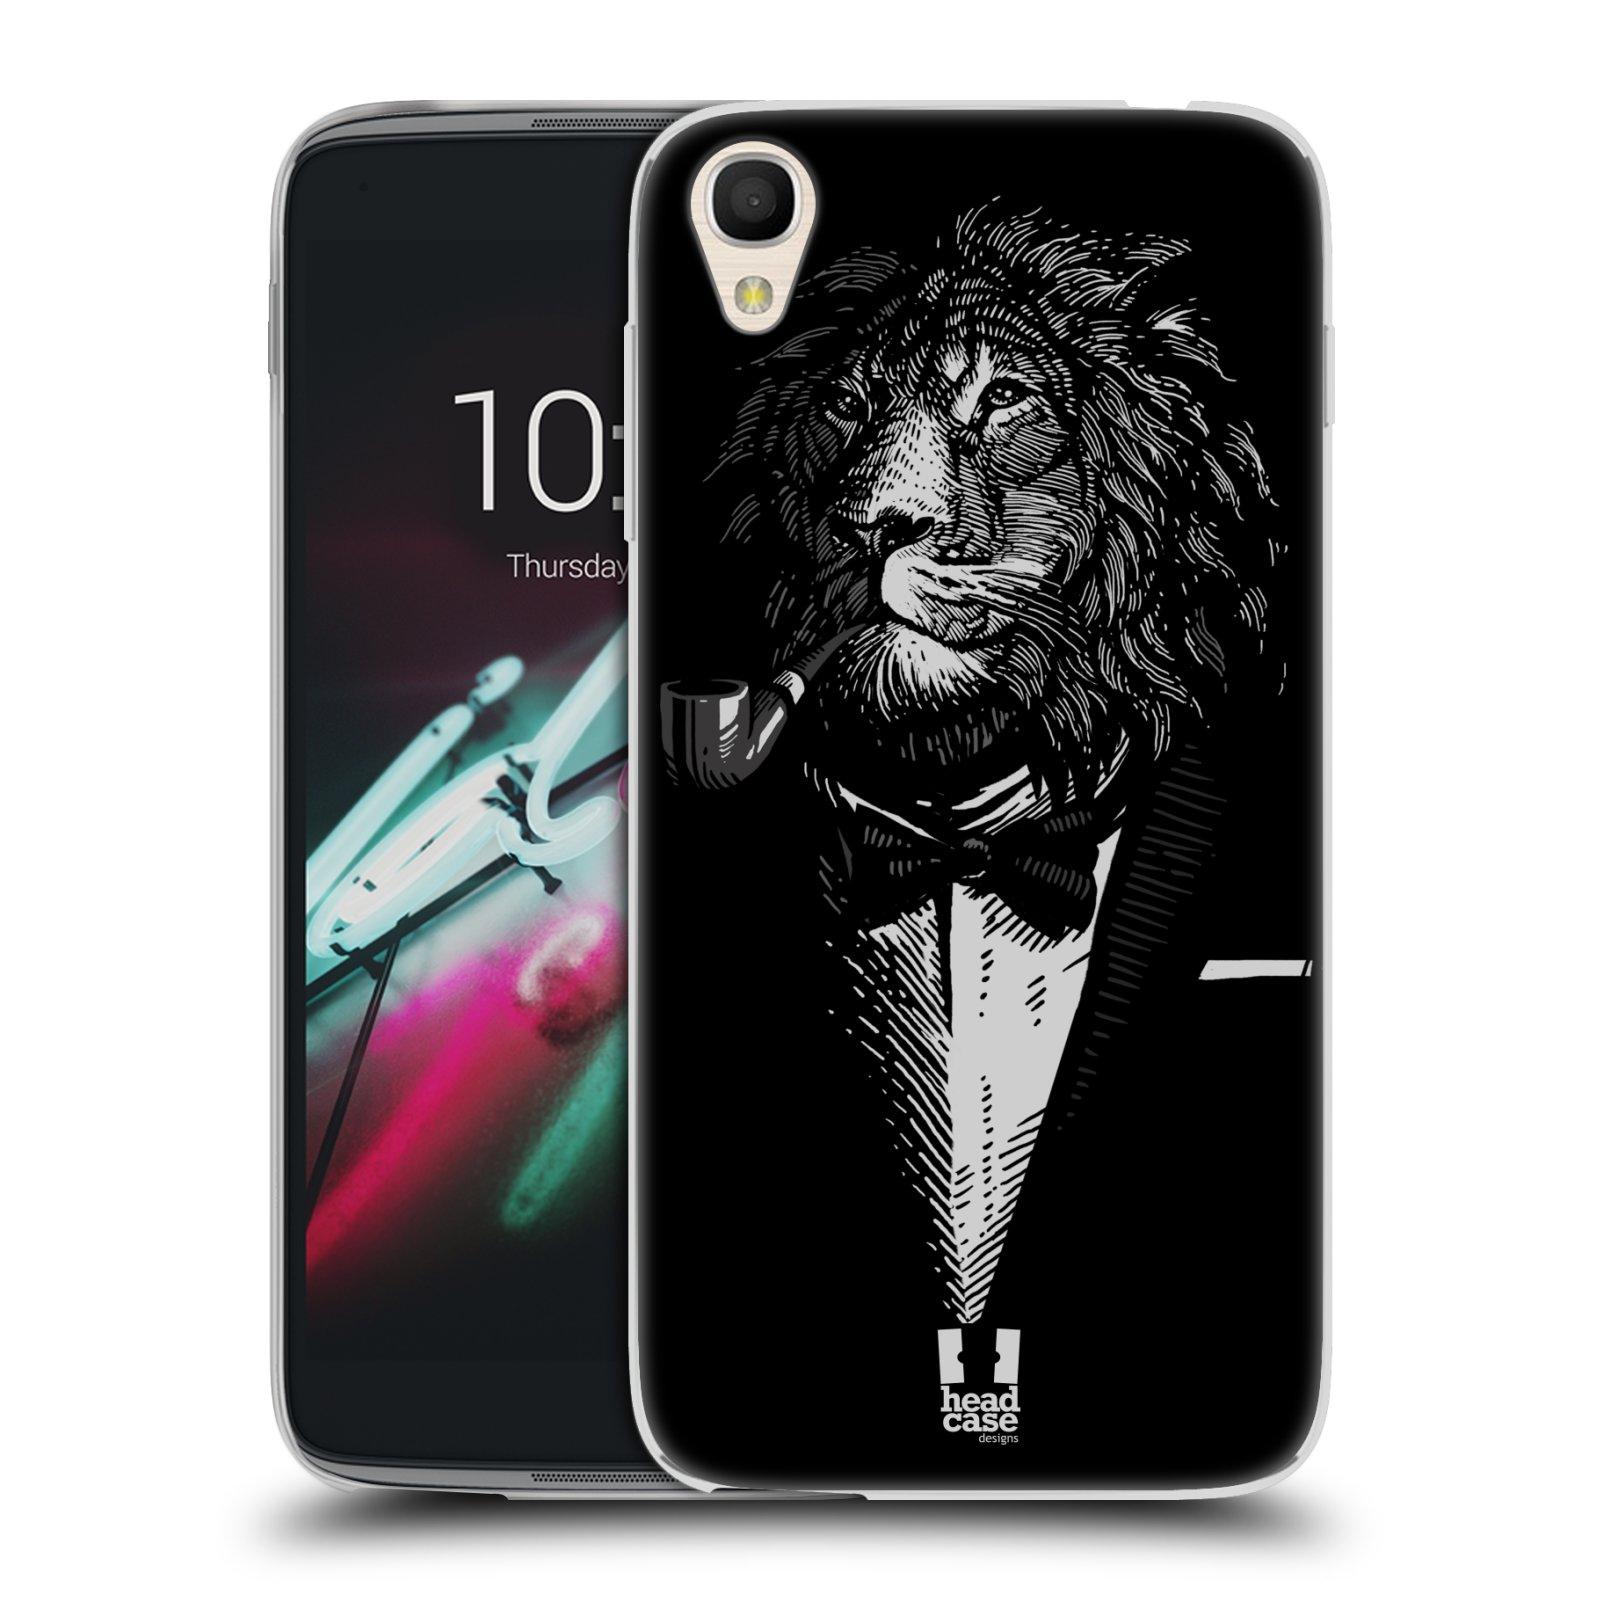 HEAD CASE silikonový obal na mobil Alcatel Idol 3 OT-6039Y (4.7) vzor Zvíře v obleku lev